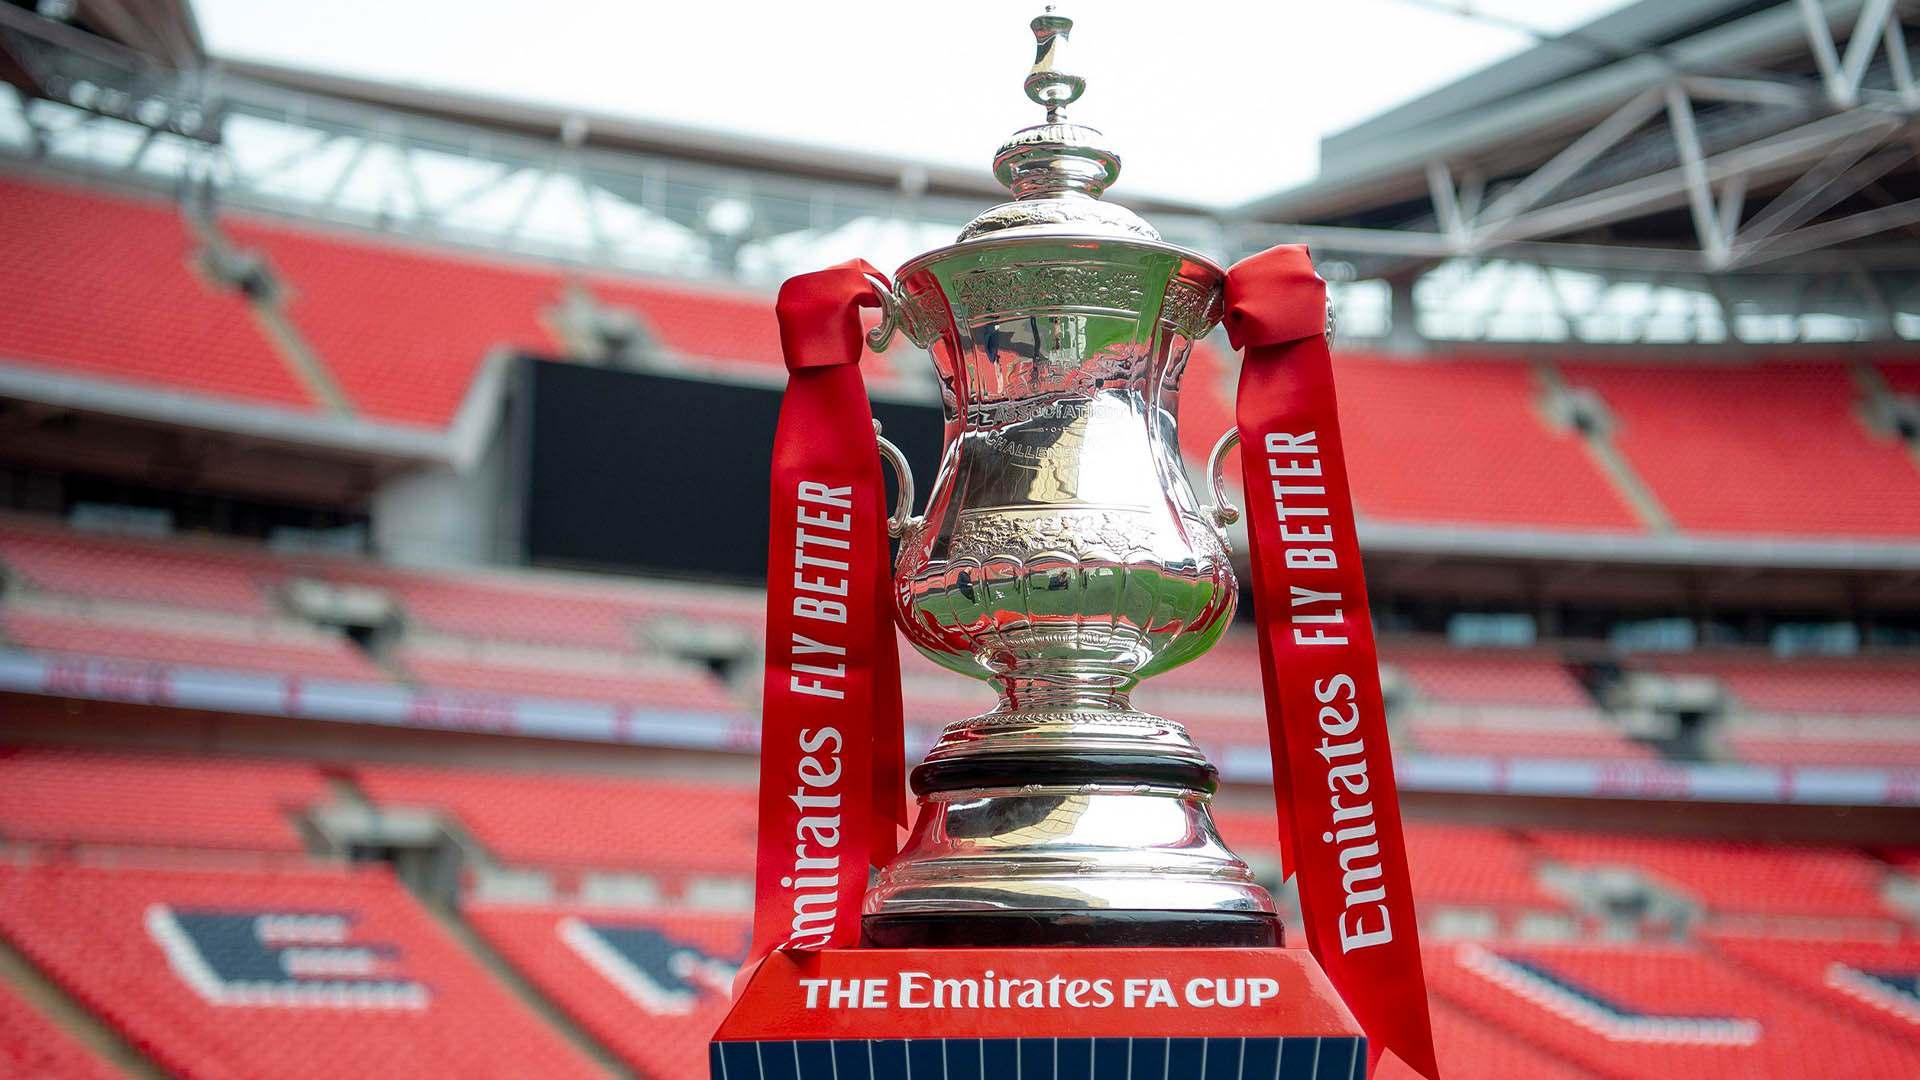 جام قهرمانی مسابقات FA Cup انگلستان